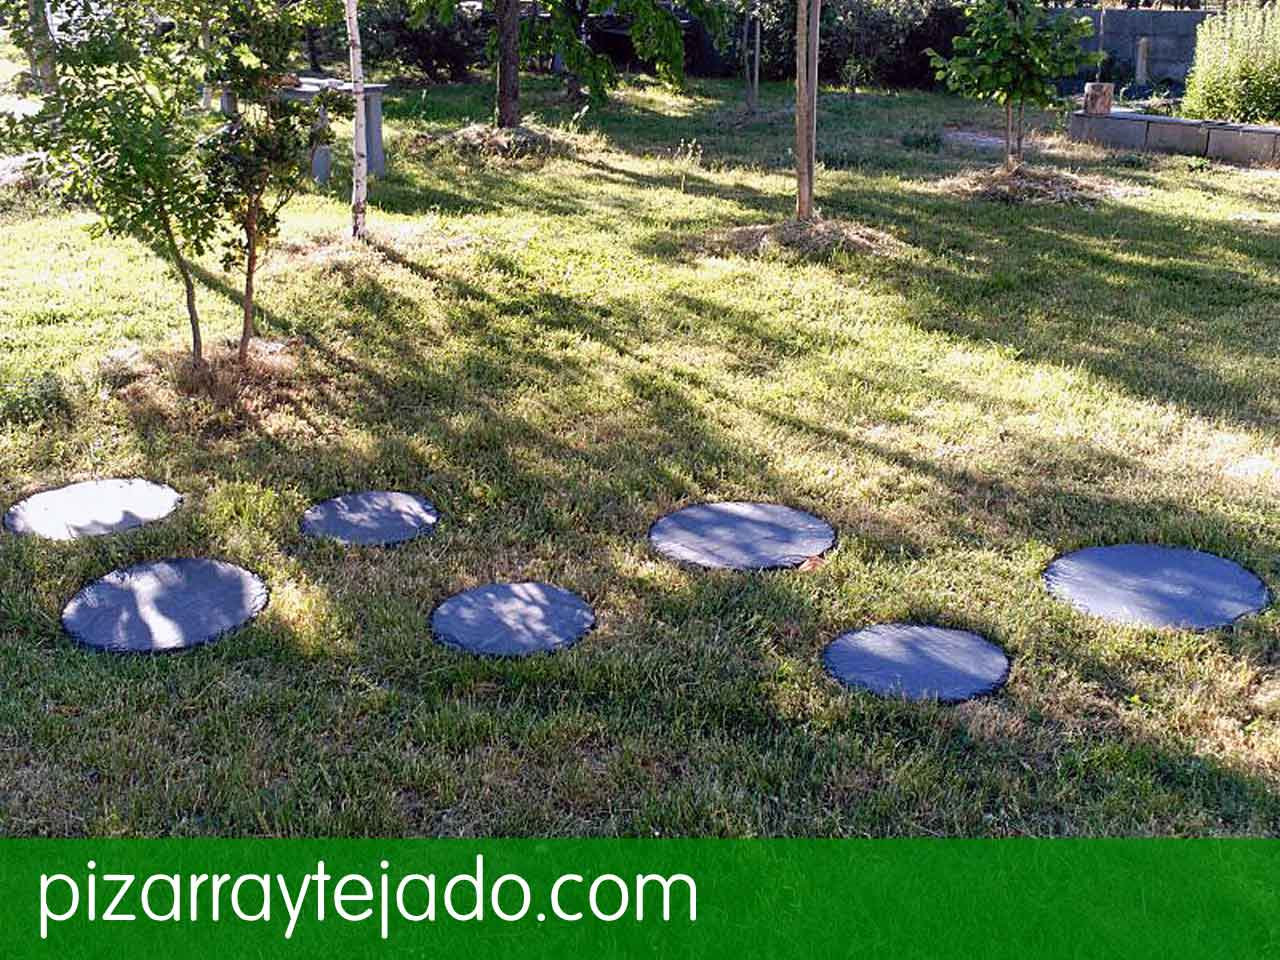 Pizarra natural para decorar exteriores e interiores - Suelos de plaqueta ...